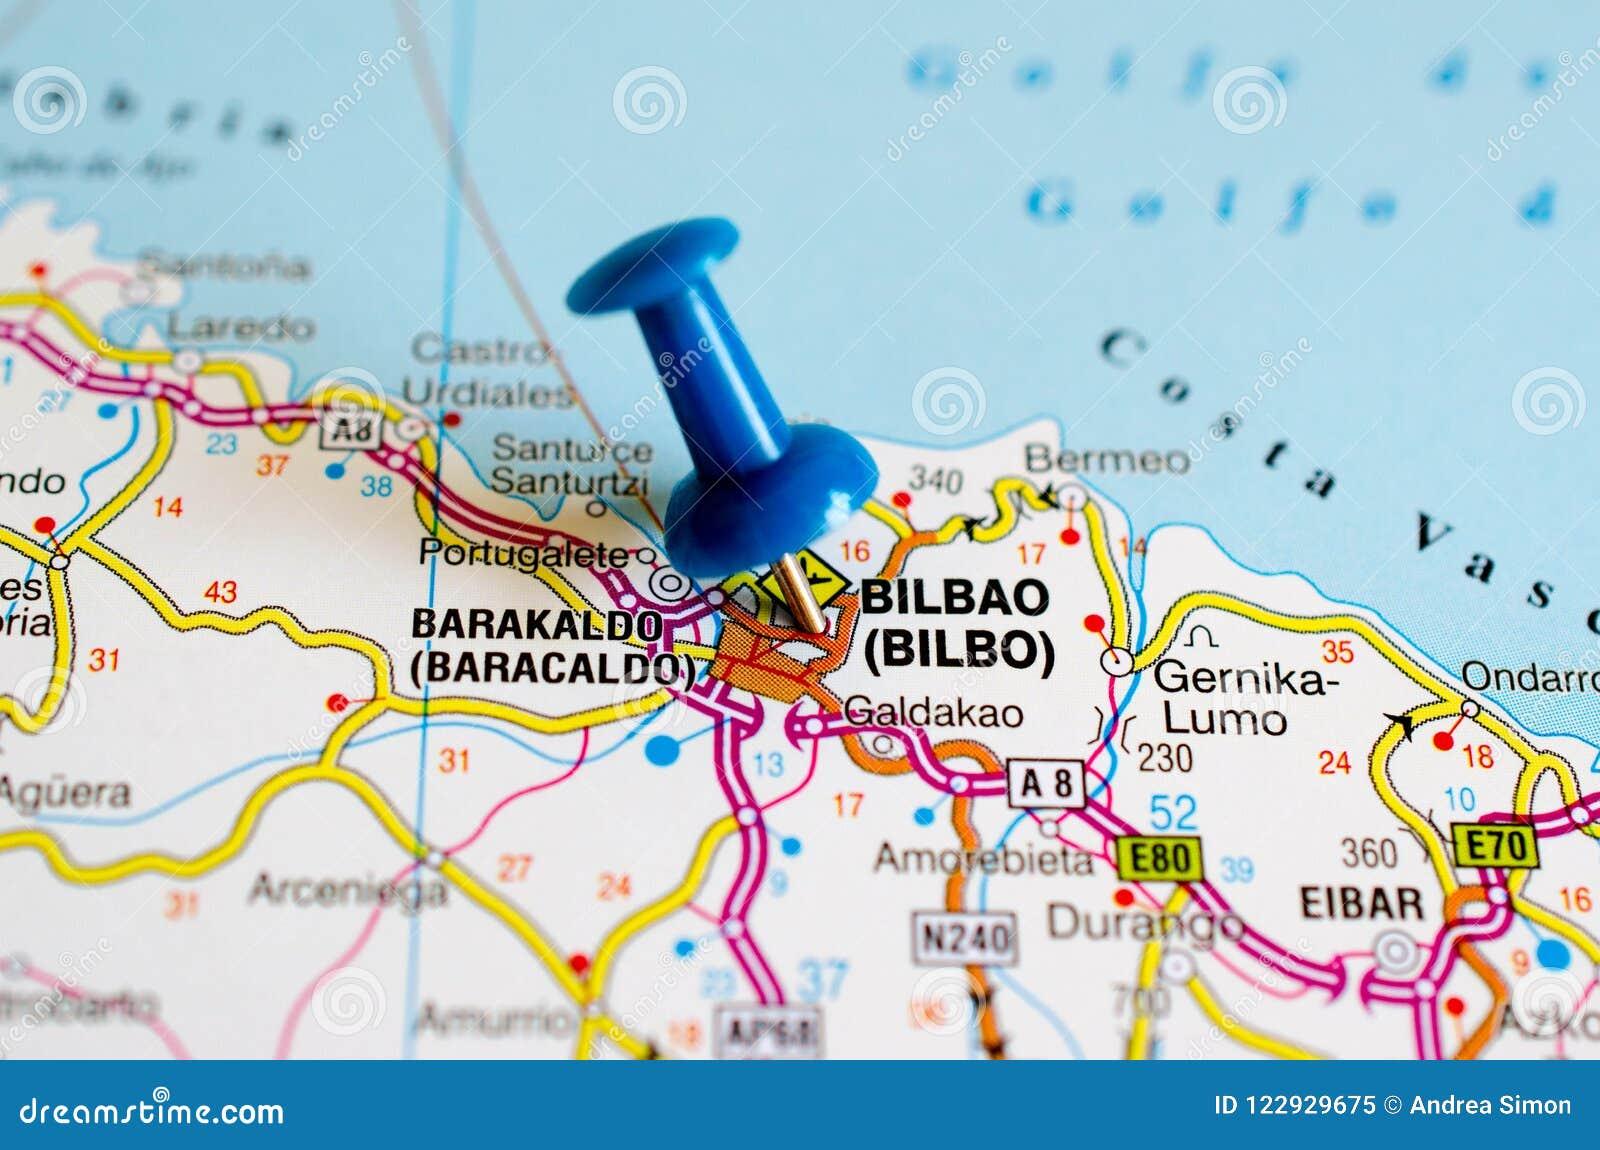 Map Of Spain Eibar.Bilbao On Map Stock Image Image Of Barakaldo Port 122929675